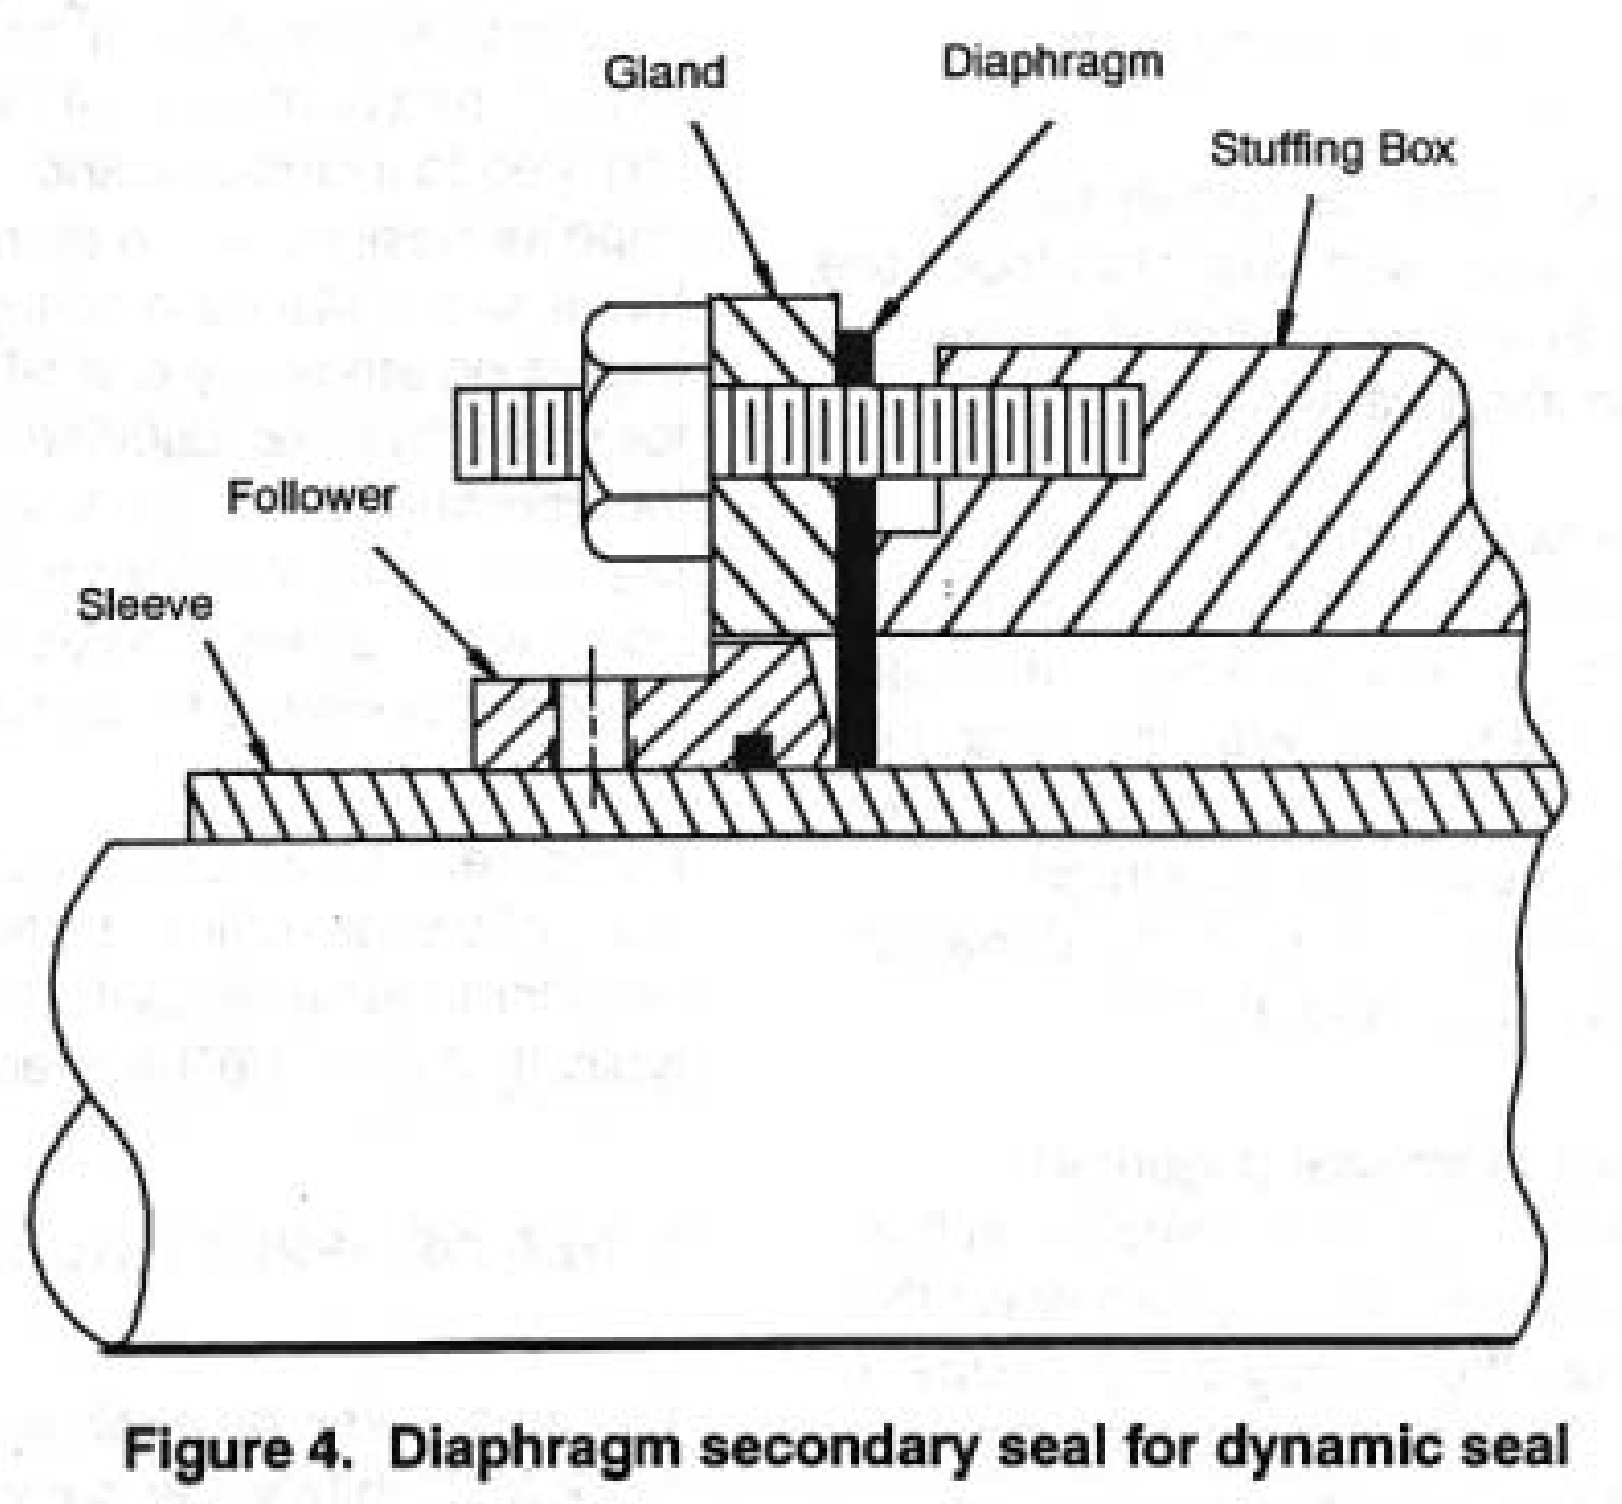 Pump Diaphragm Seal Operation - figure 4